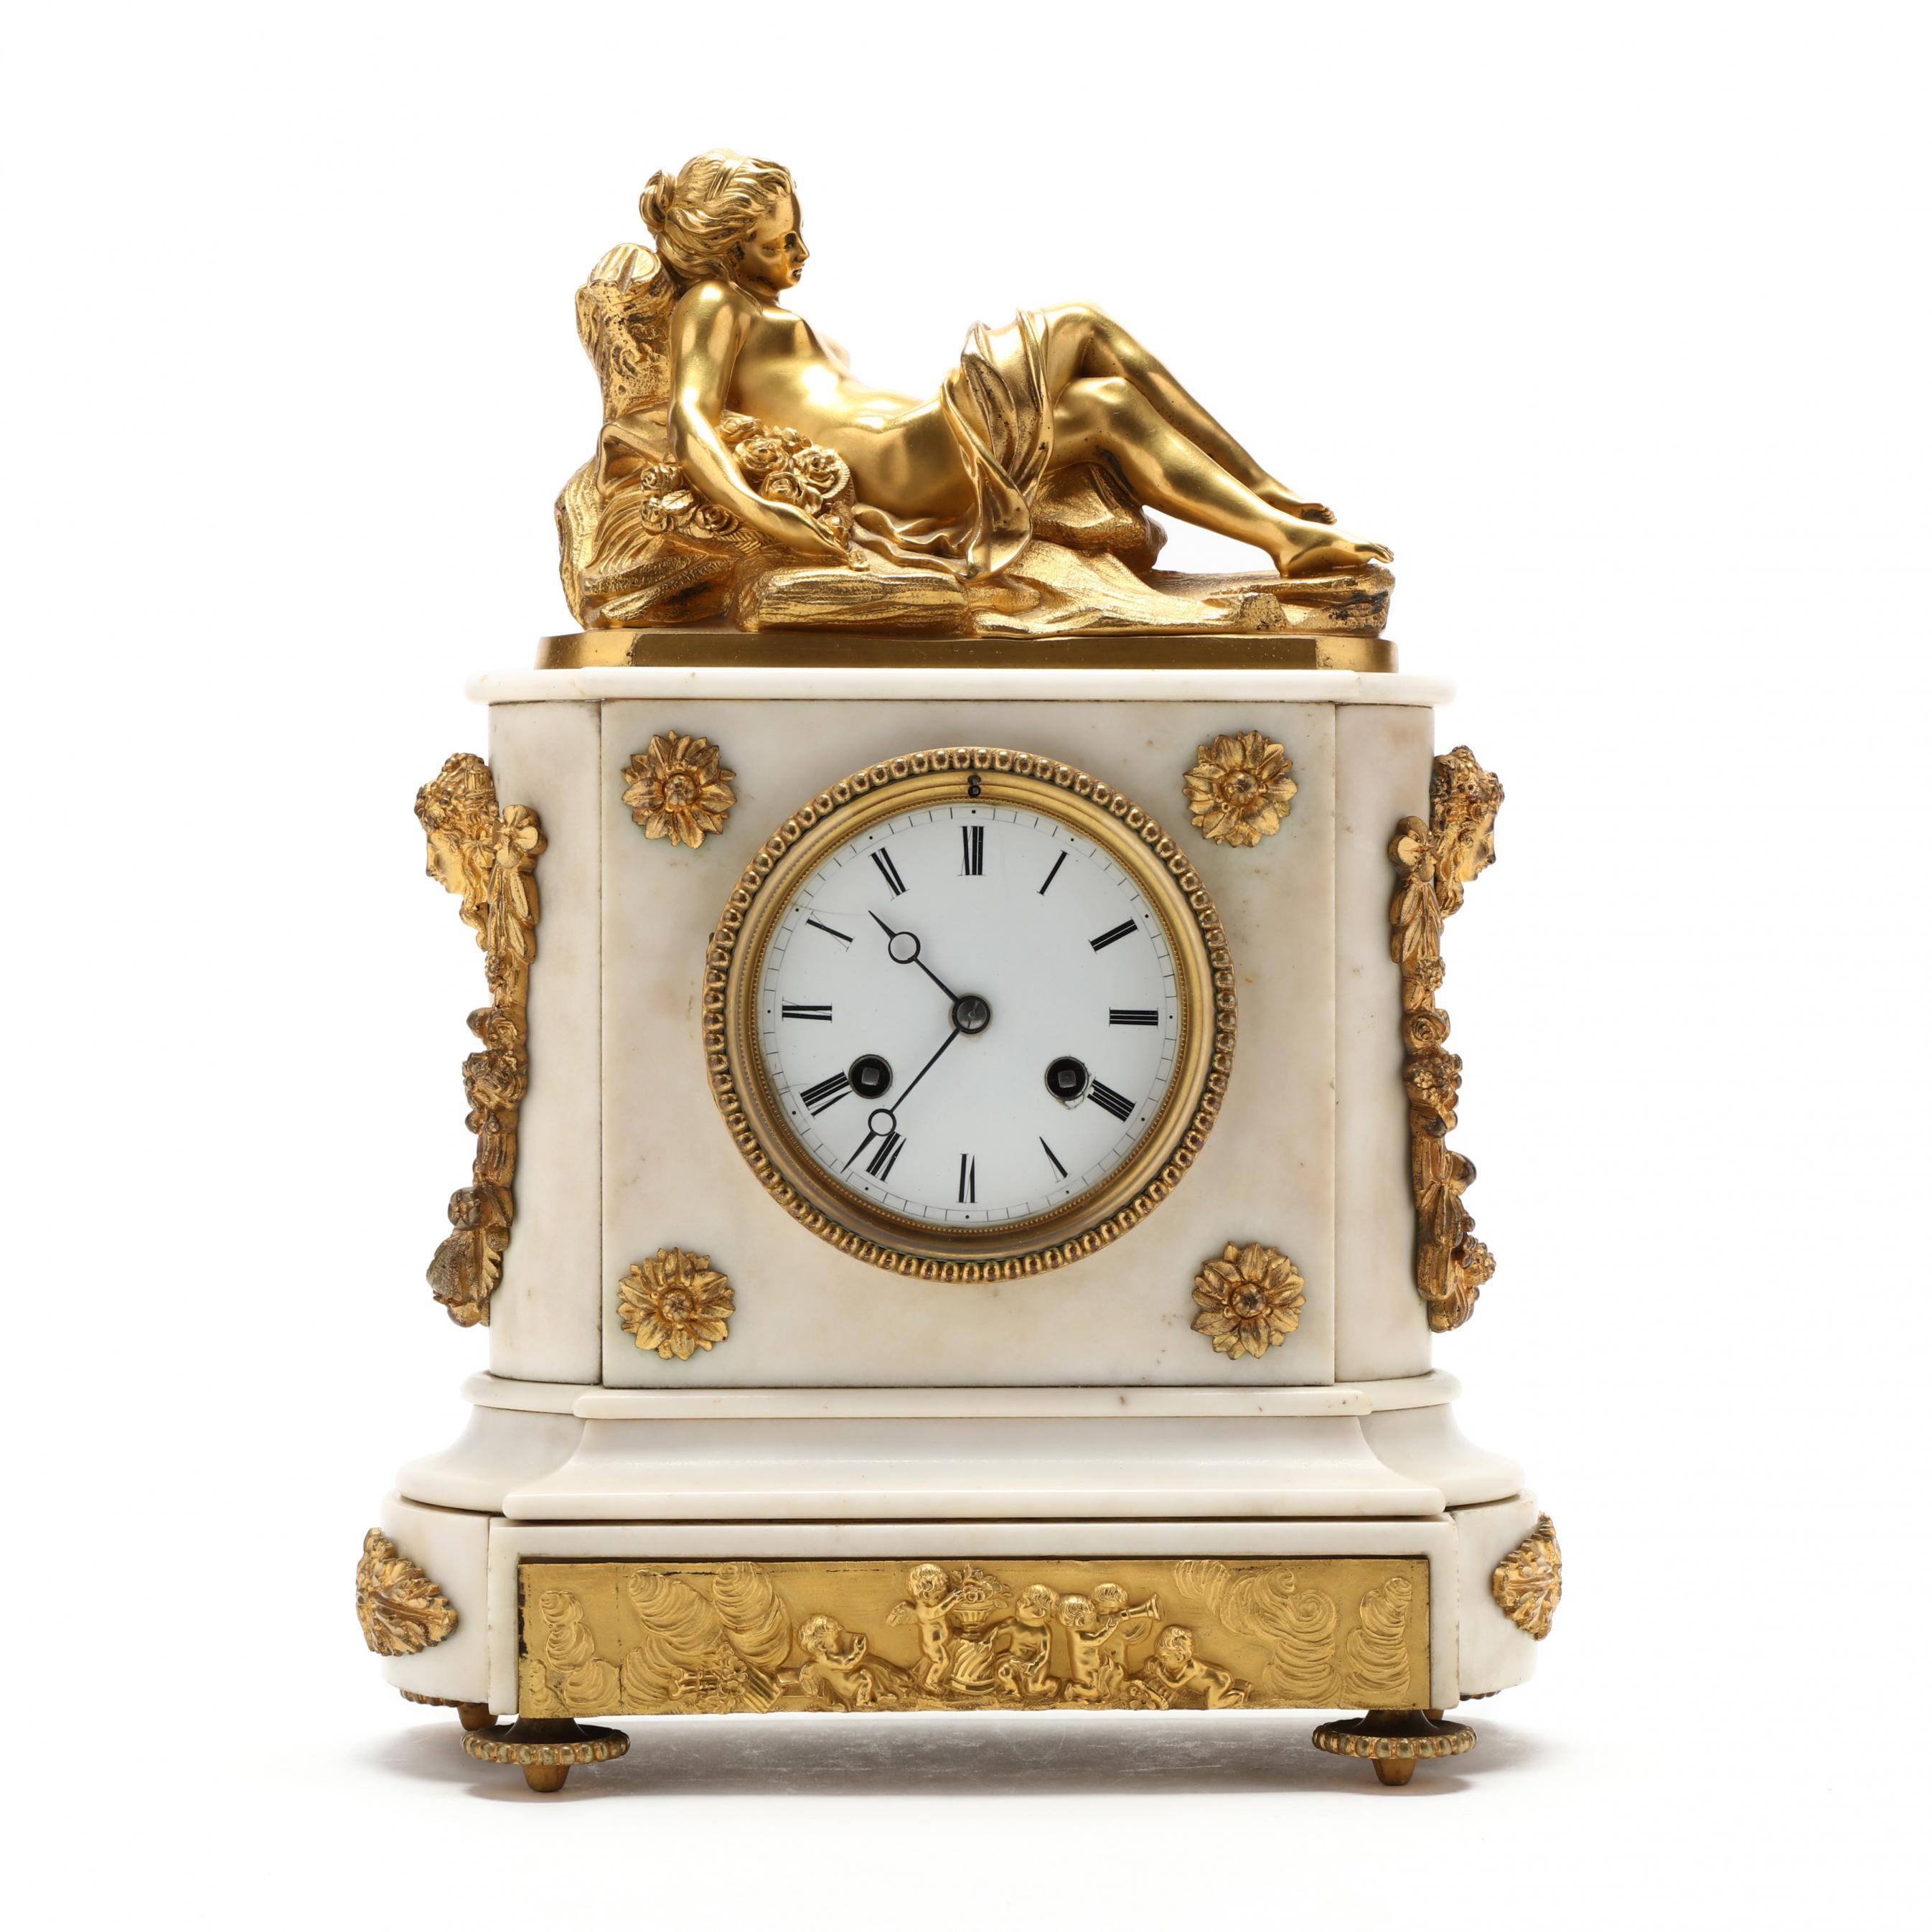 a-fine-french-ormolu-and-marble-mantel-clock-baschet-baullier